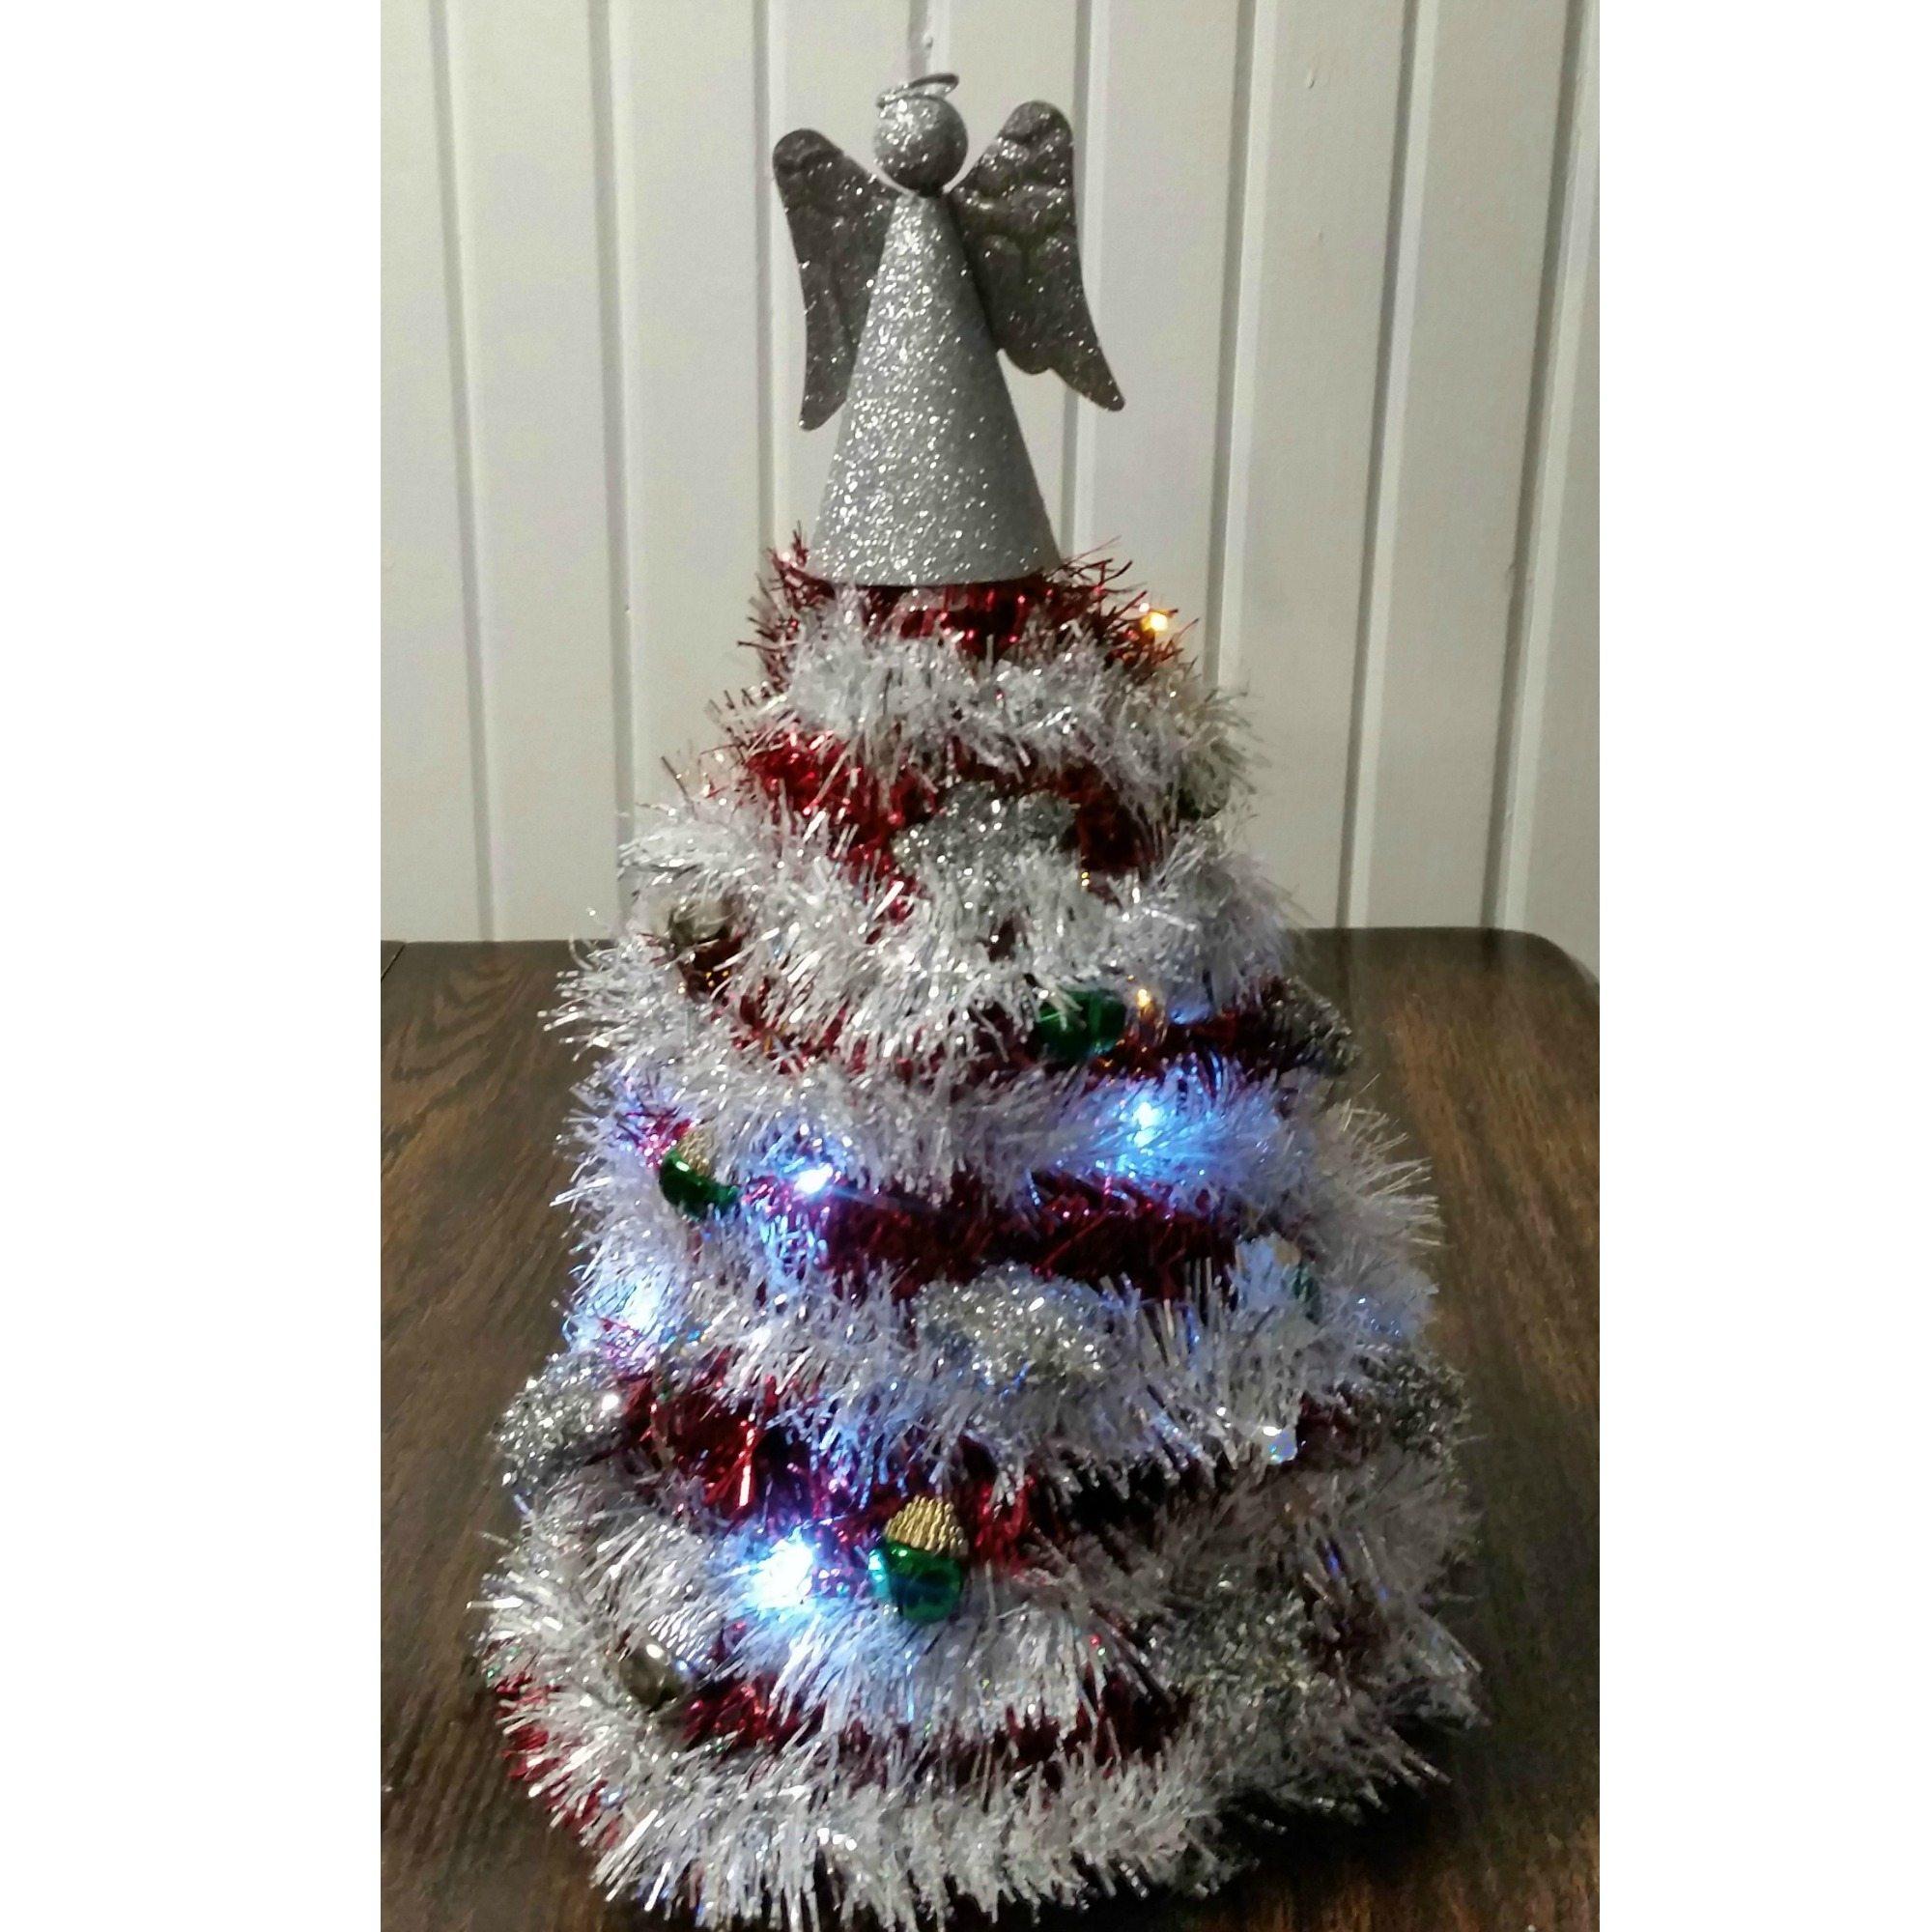 Dollar store garland christmas tree my repurposed life for Garland christmas tree craft